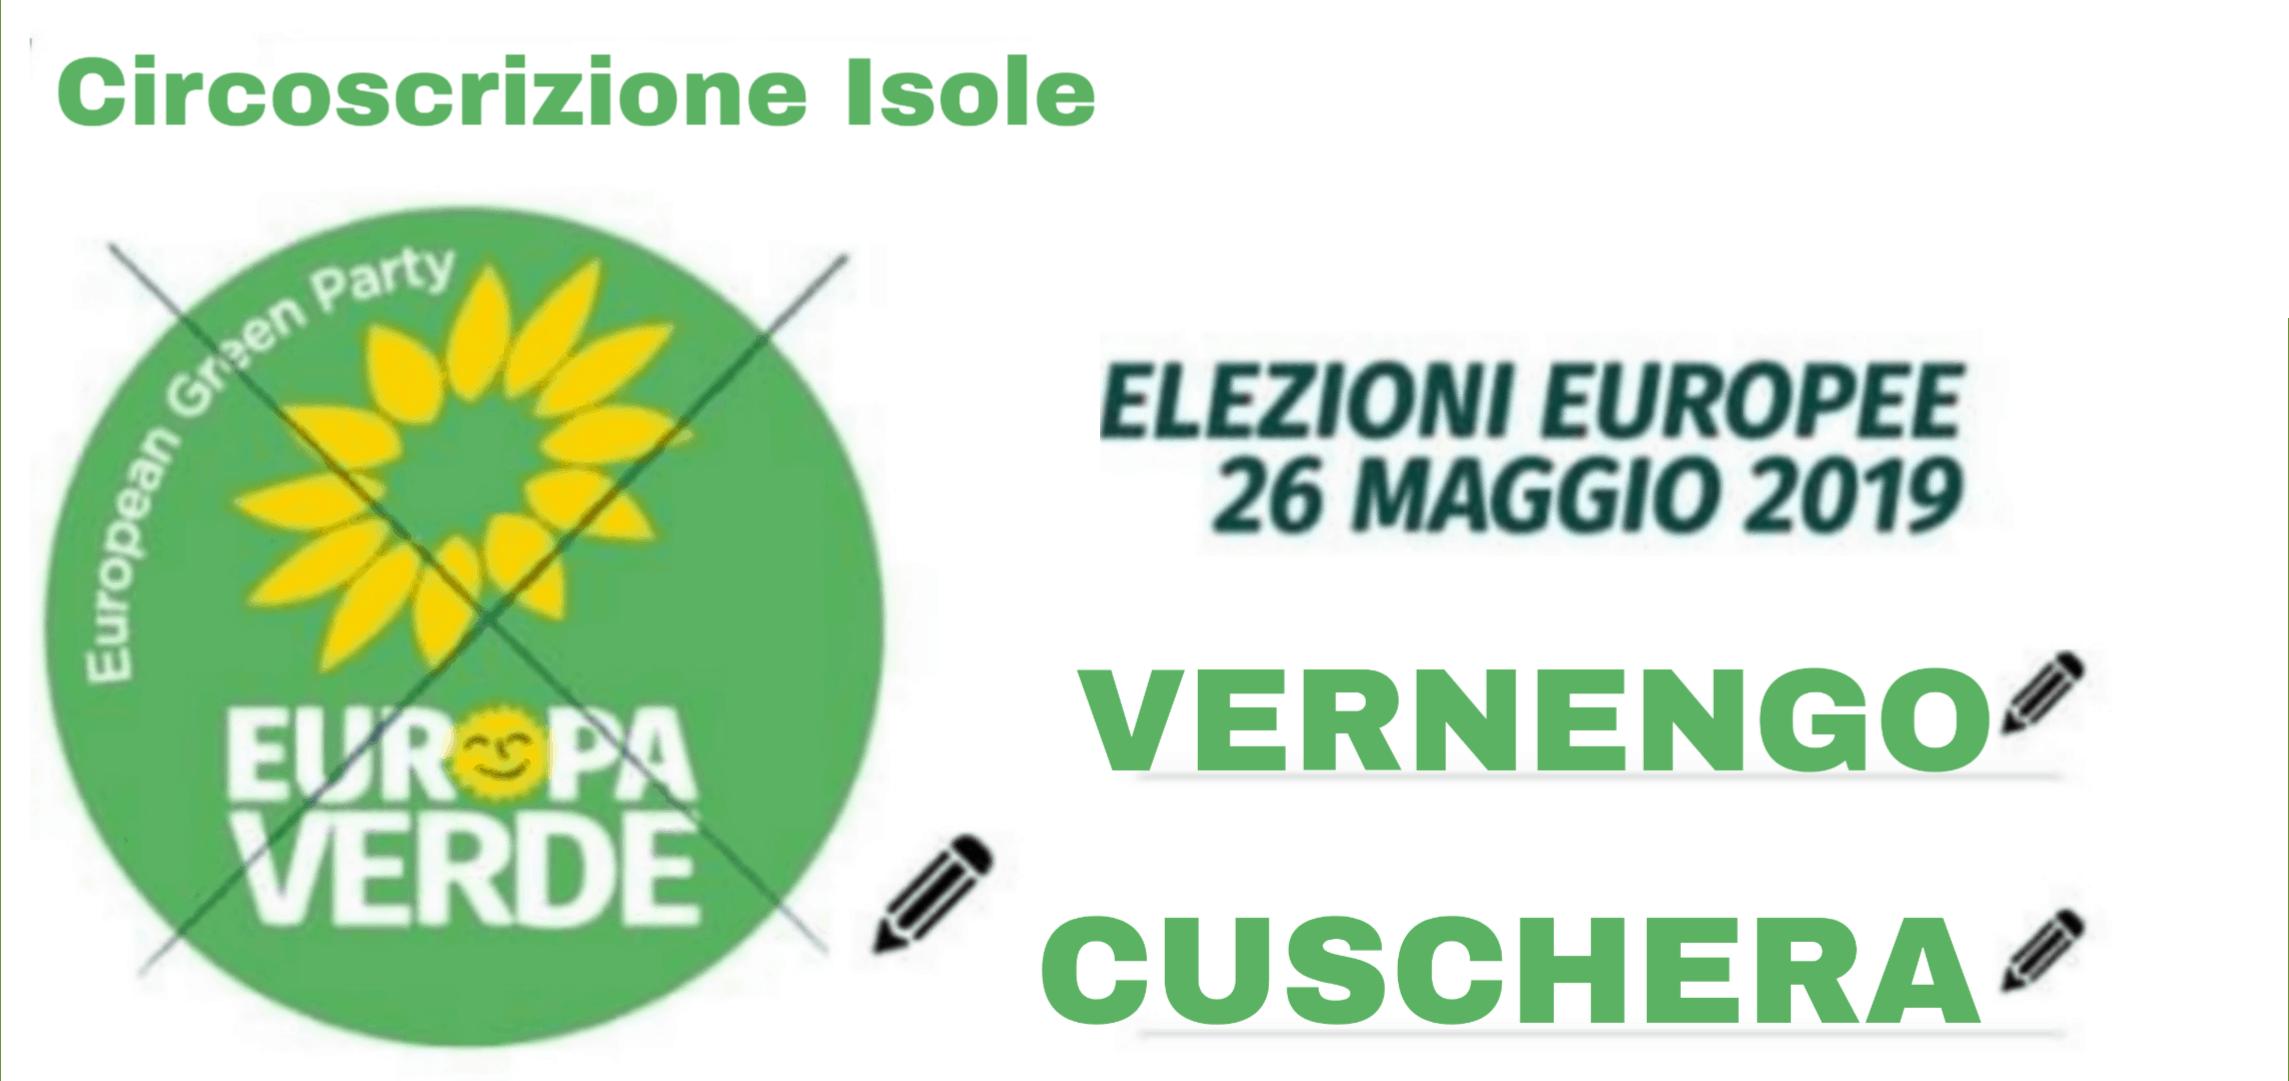 Europee, il Fronte Verde sostiene Giuseppe Cuschera